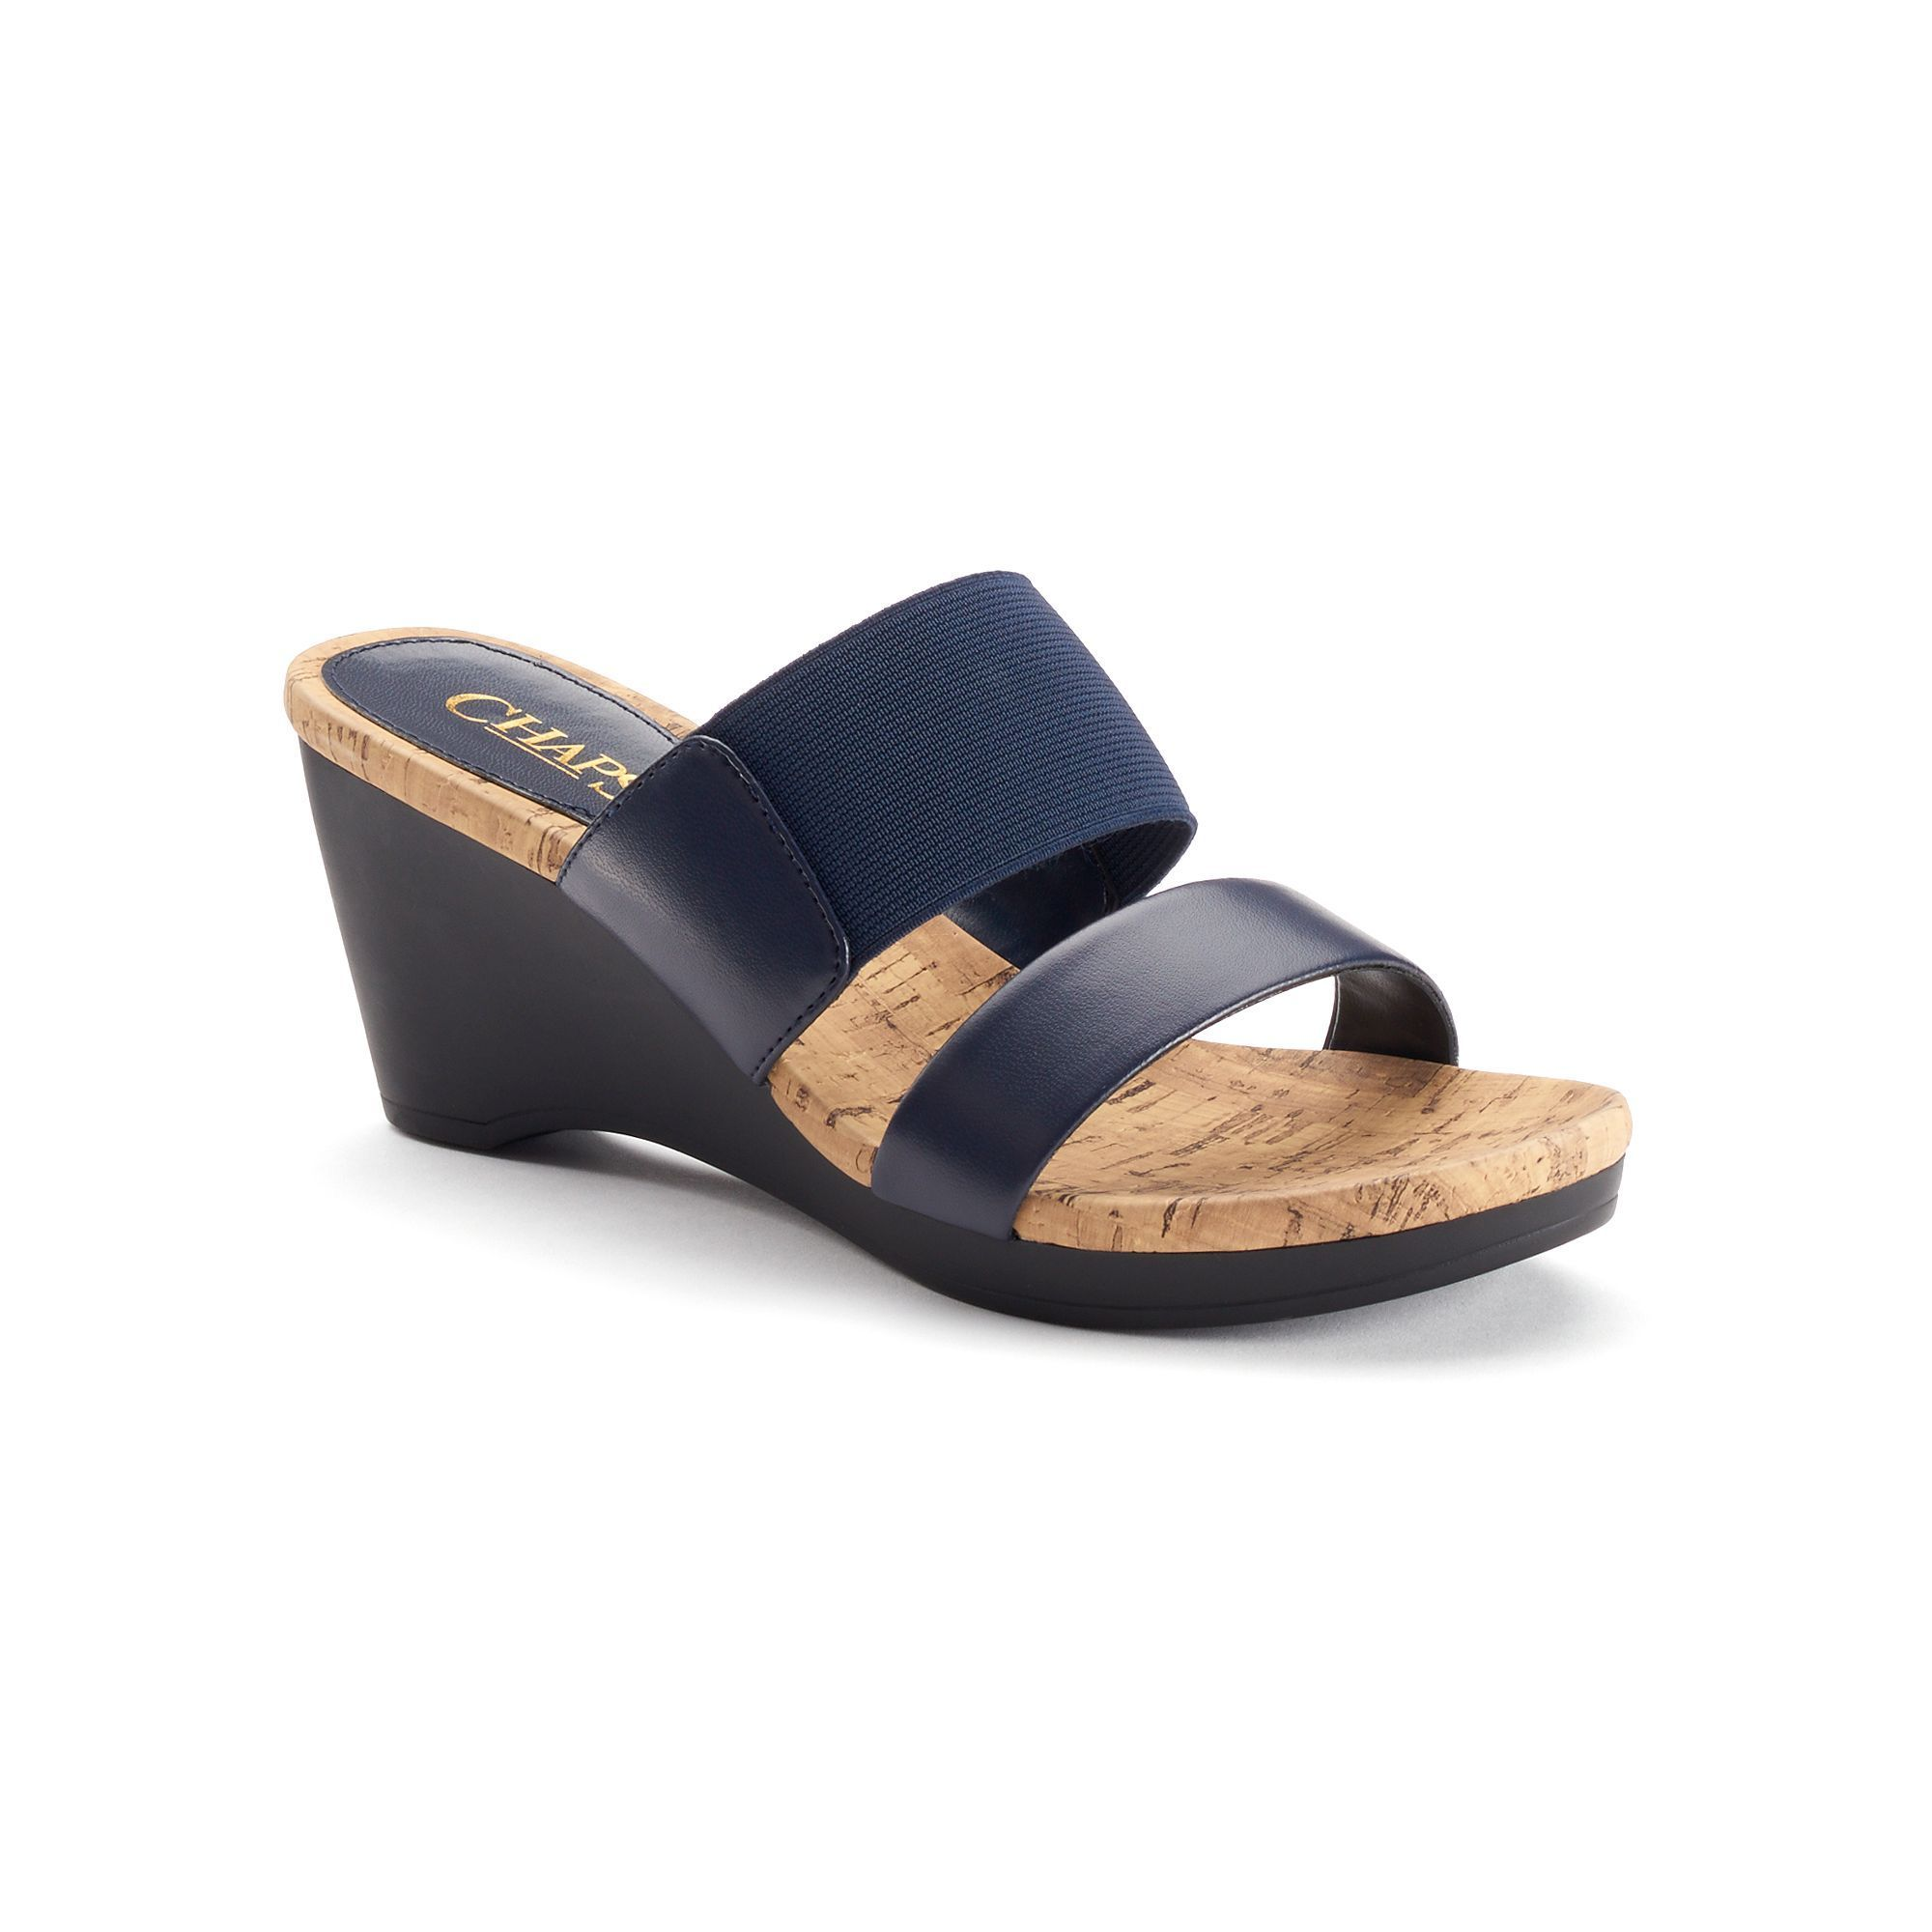 ca448e1bce Chaps Rhoda Women's Slip-On Wedge Dress Sandals, Size: 9.5 B, Blue (Navy)